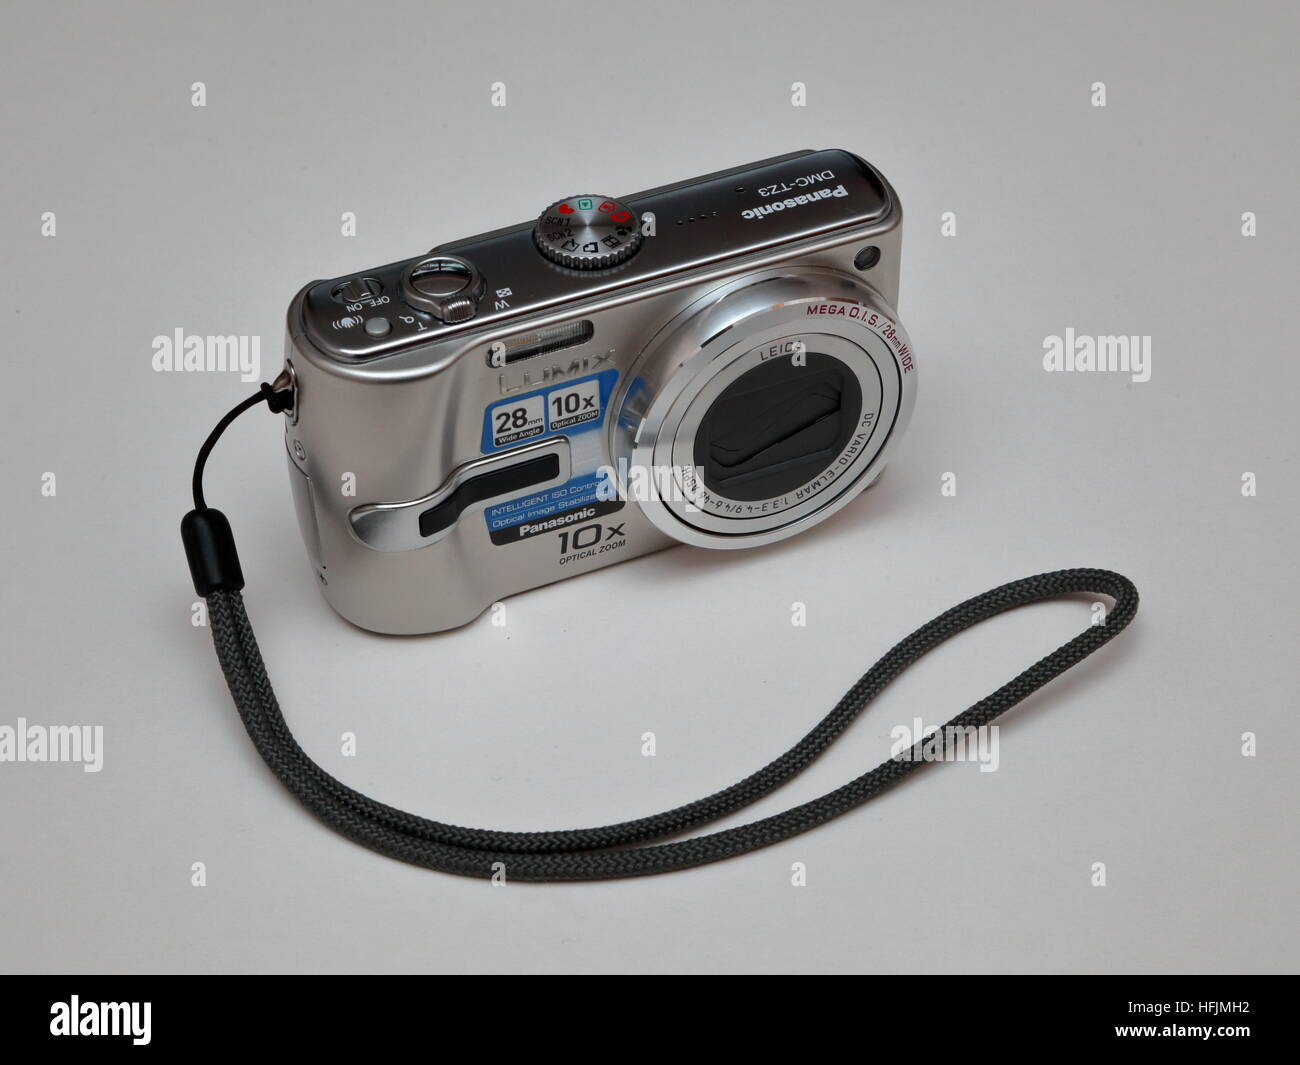 Panasonic Lumix DMC-TZ3 7.2Mpx Digital compact camera - Stock Image